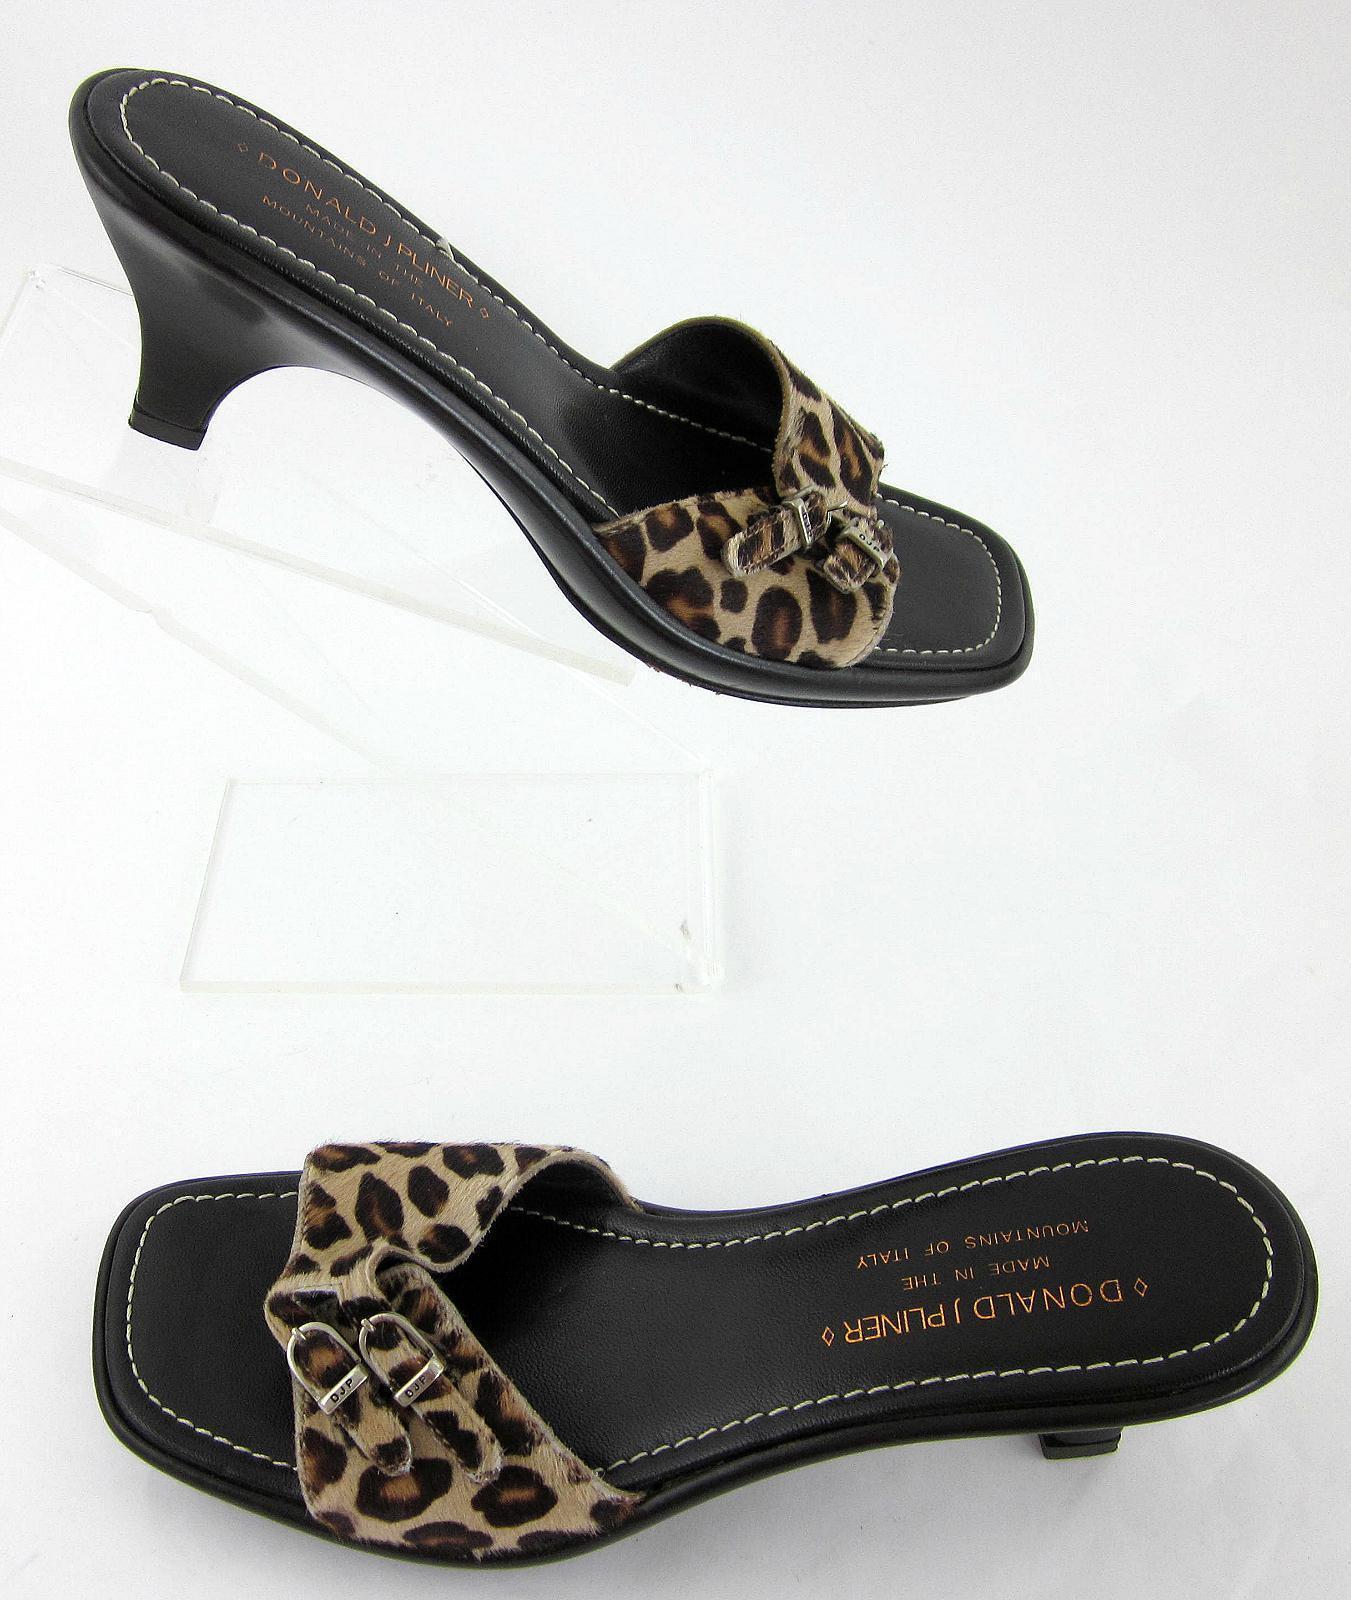 Donald J Pliner Open Toe Pony Hair Sandales Cheetah Print Sz 7.5M Made In